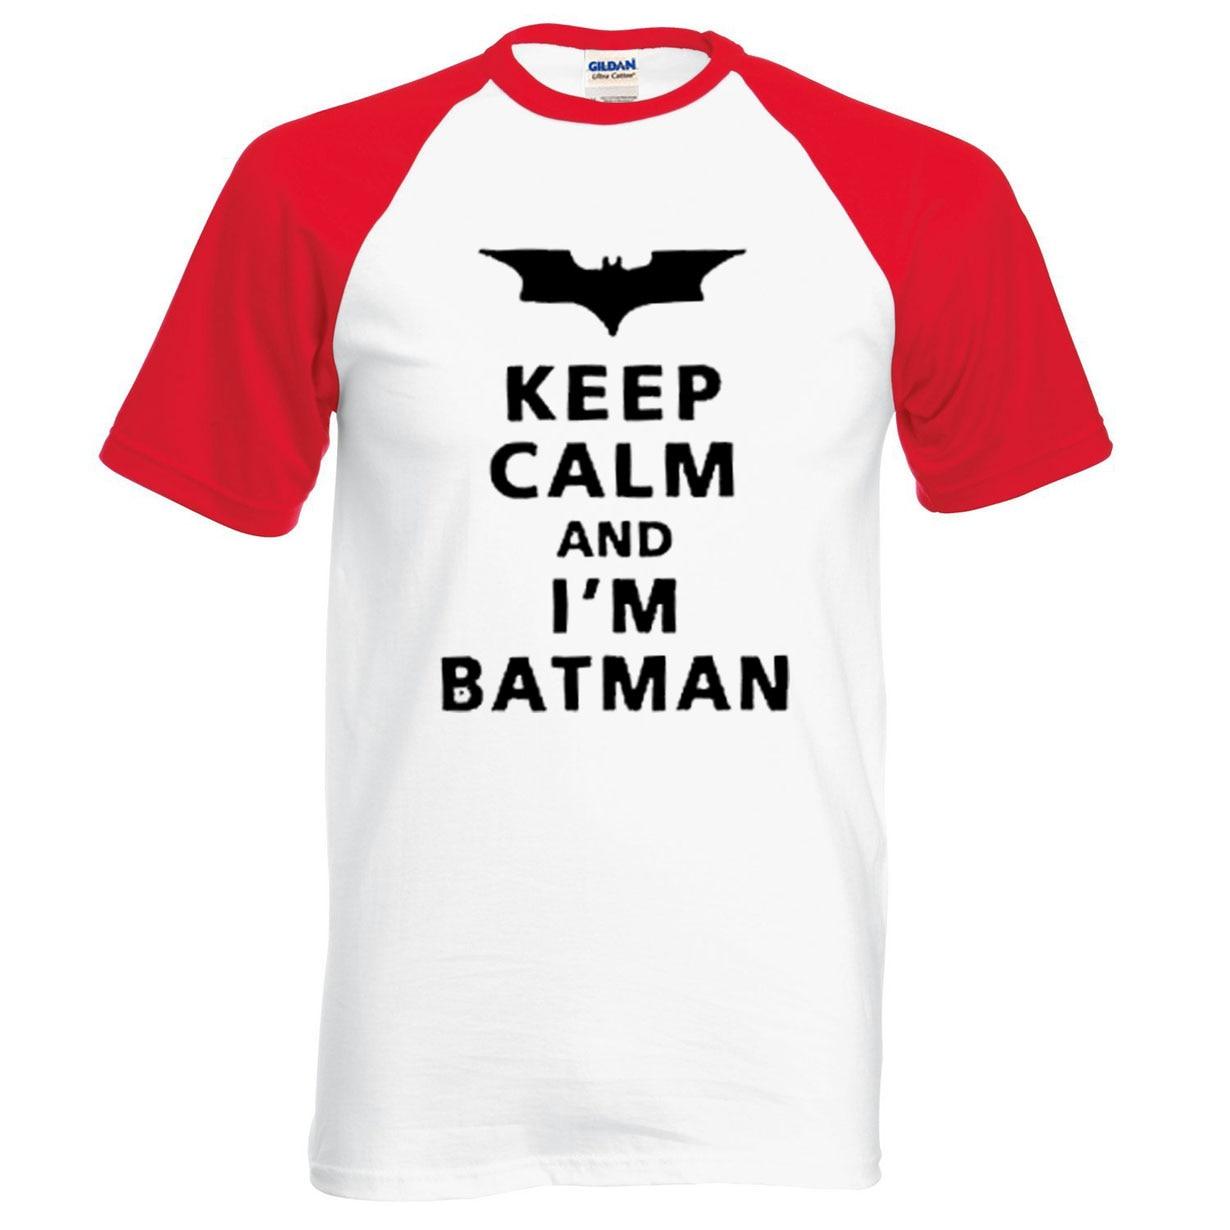 Batman T Shirts Men Keep Calm I Am Batman 2019 new summer 100% cotton raglan men t-shirt casual short sleeve o-neck top tees